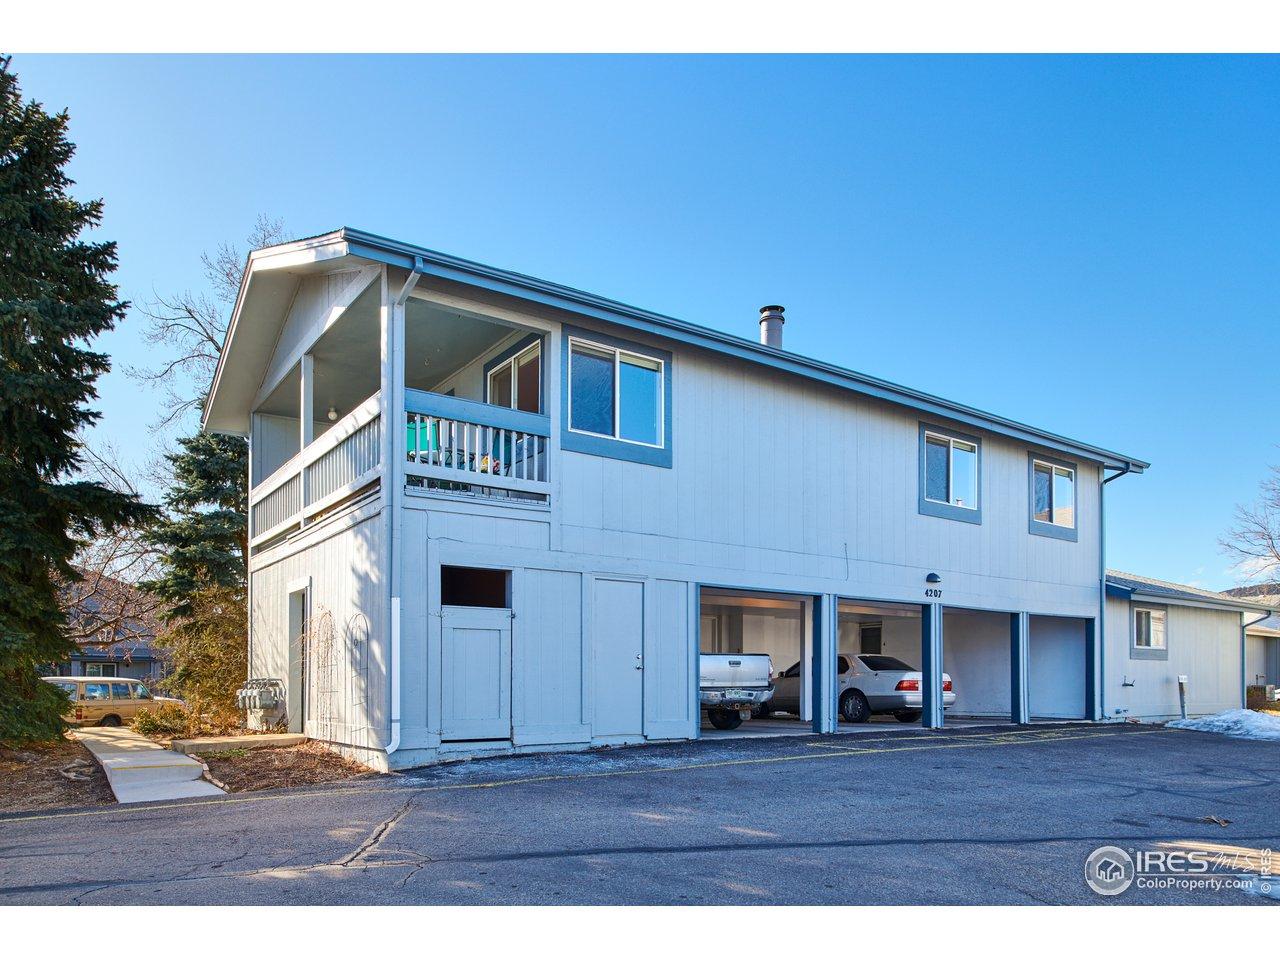 2nd floor unit w/ carport & storage space